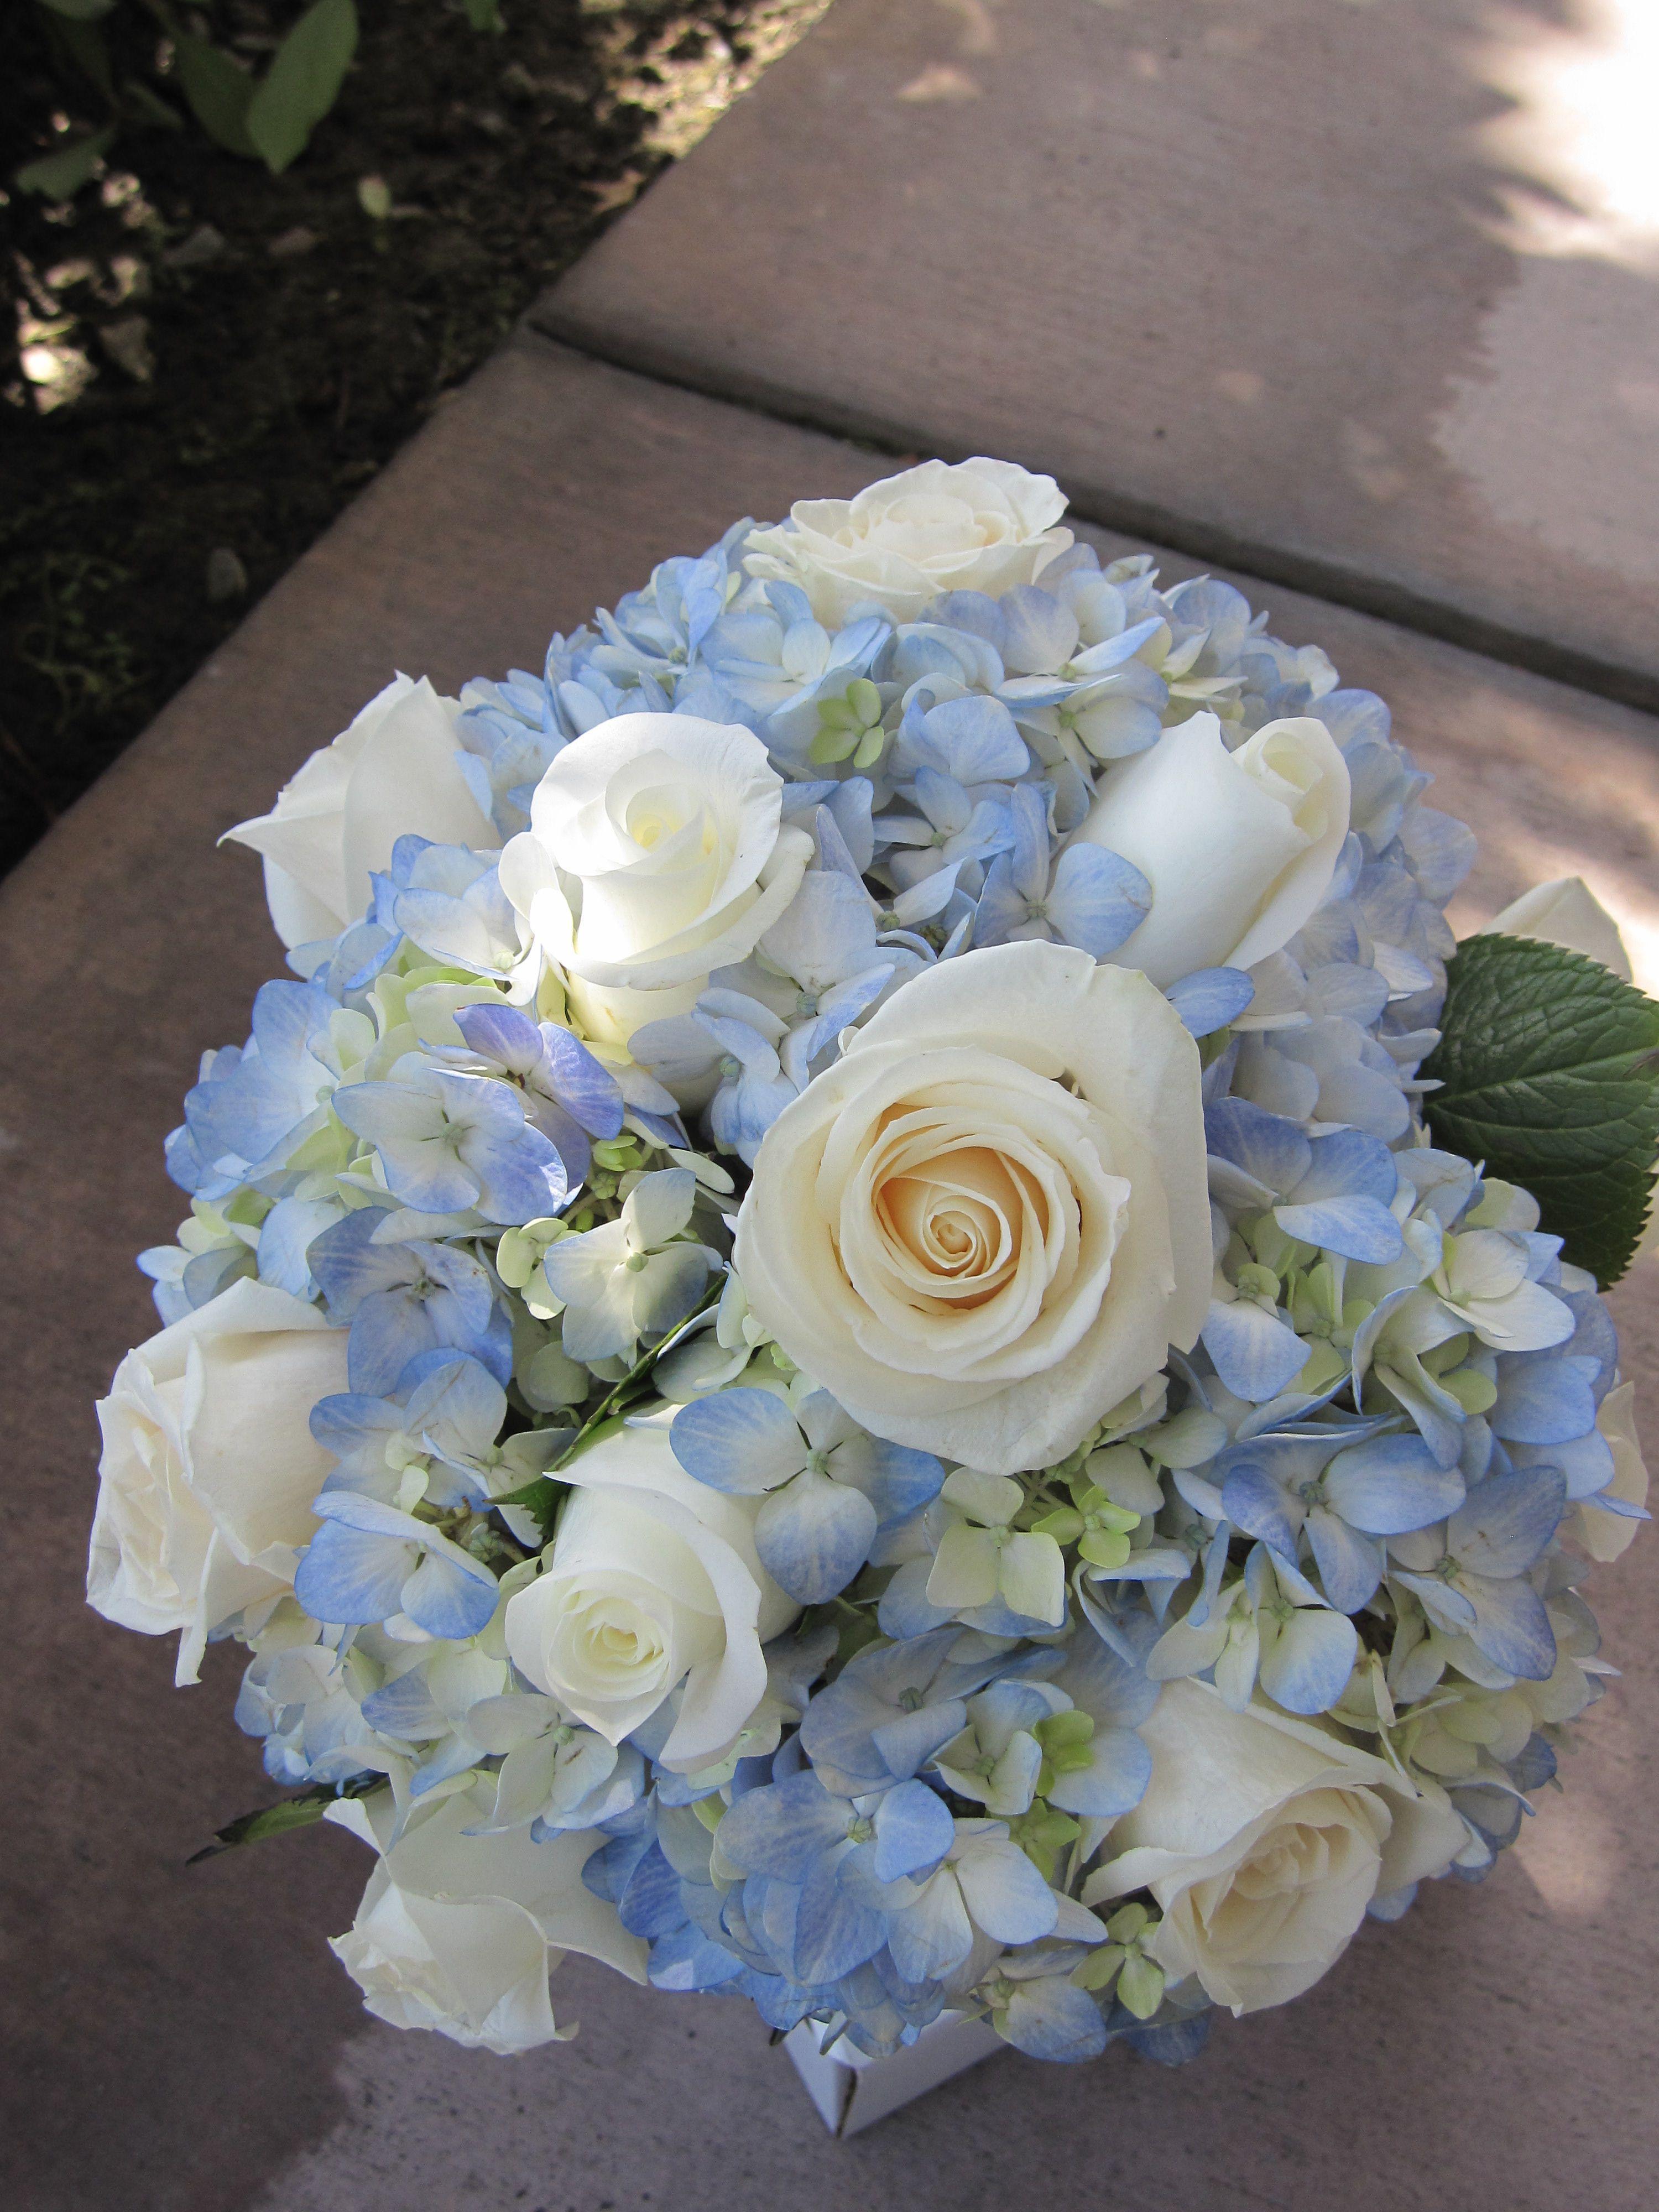 Bridal Bouquet Blue Hydrangeas With White And Ivory Roses Blue Wedding Bouquet Blue Wedding Flowers Bridal Bouquet Blue